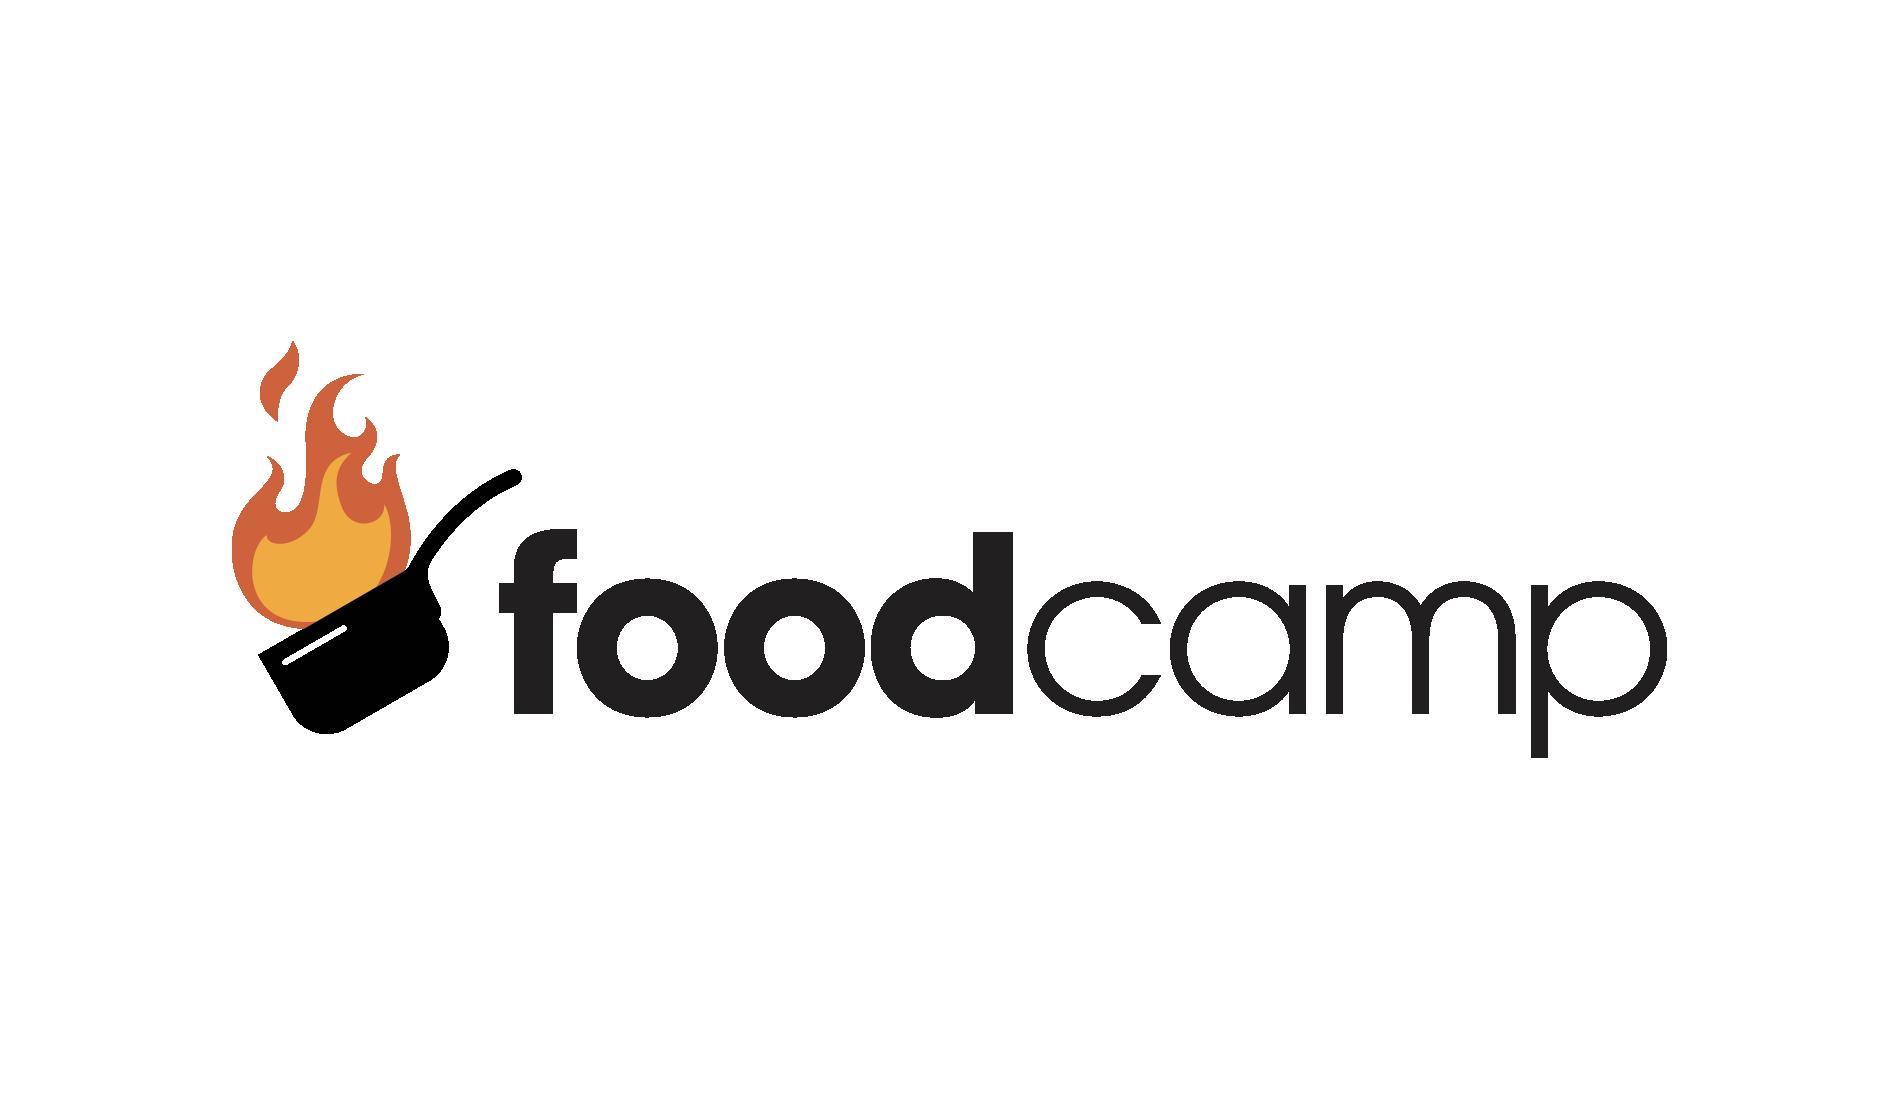 foodcamp-header-logo